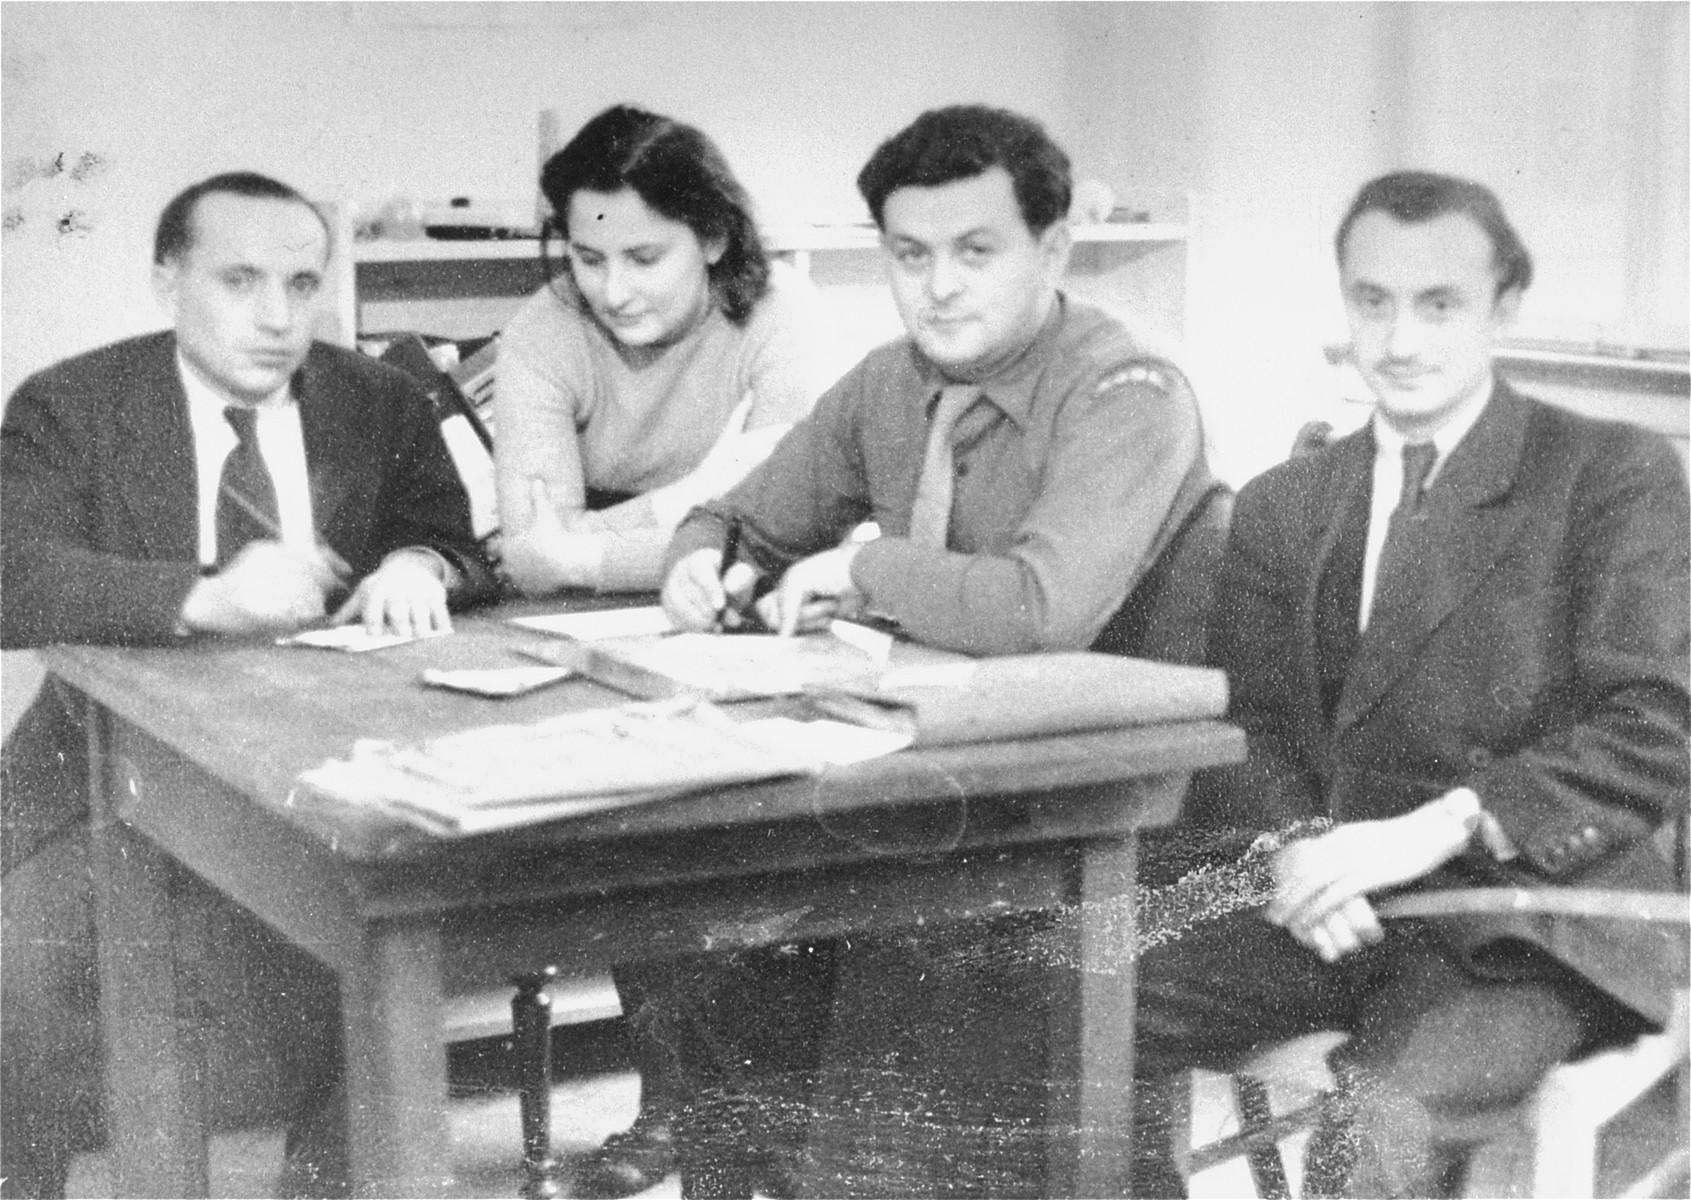 UNRRA workers meet at Student's Hostel in Stuttgart.    Henry Brauner, UNRRA supply officer, is on the far right.